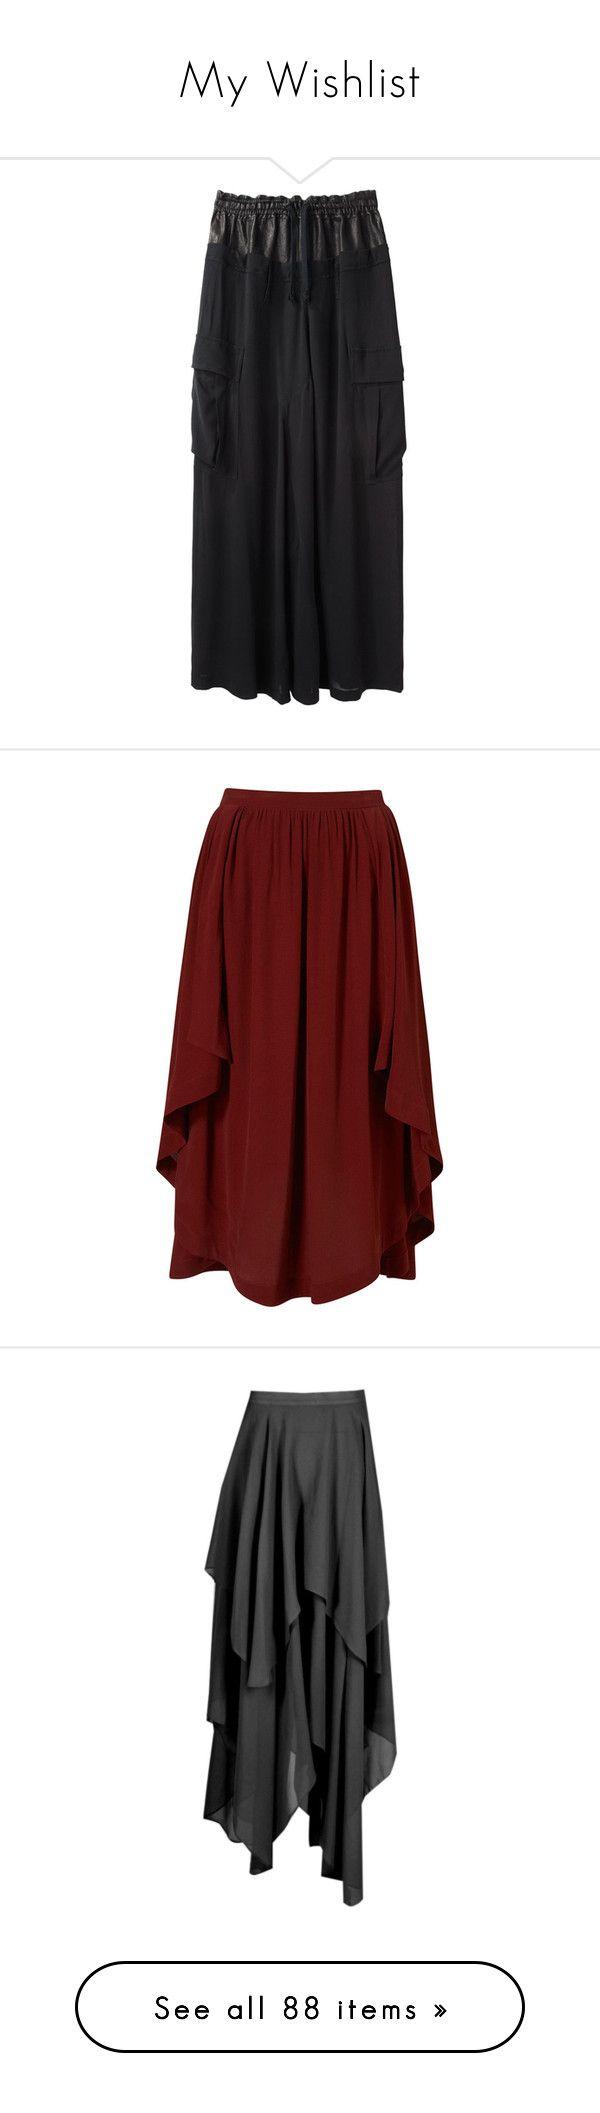 """My Wishlist"" by mxbatfiend ❤ liked on Polyvore featuring goth, darkmori, stregafashion, skirts, maxi skirts, ruched maxi skirt, long skirts, long sheer maxi skirt, long ruched skirt and long pleated skirt"